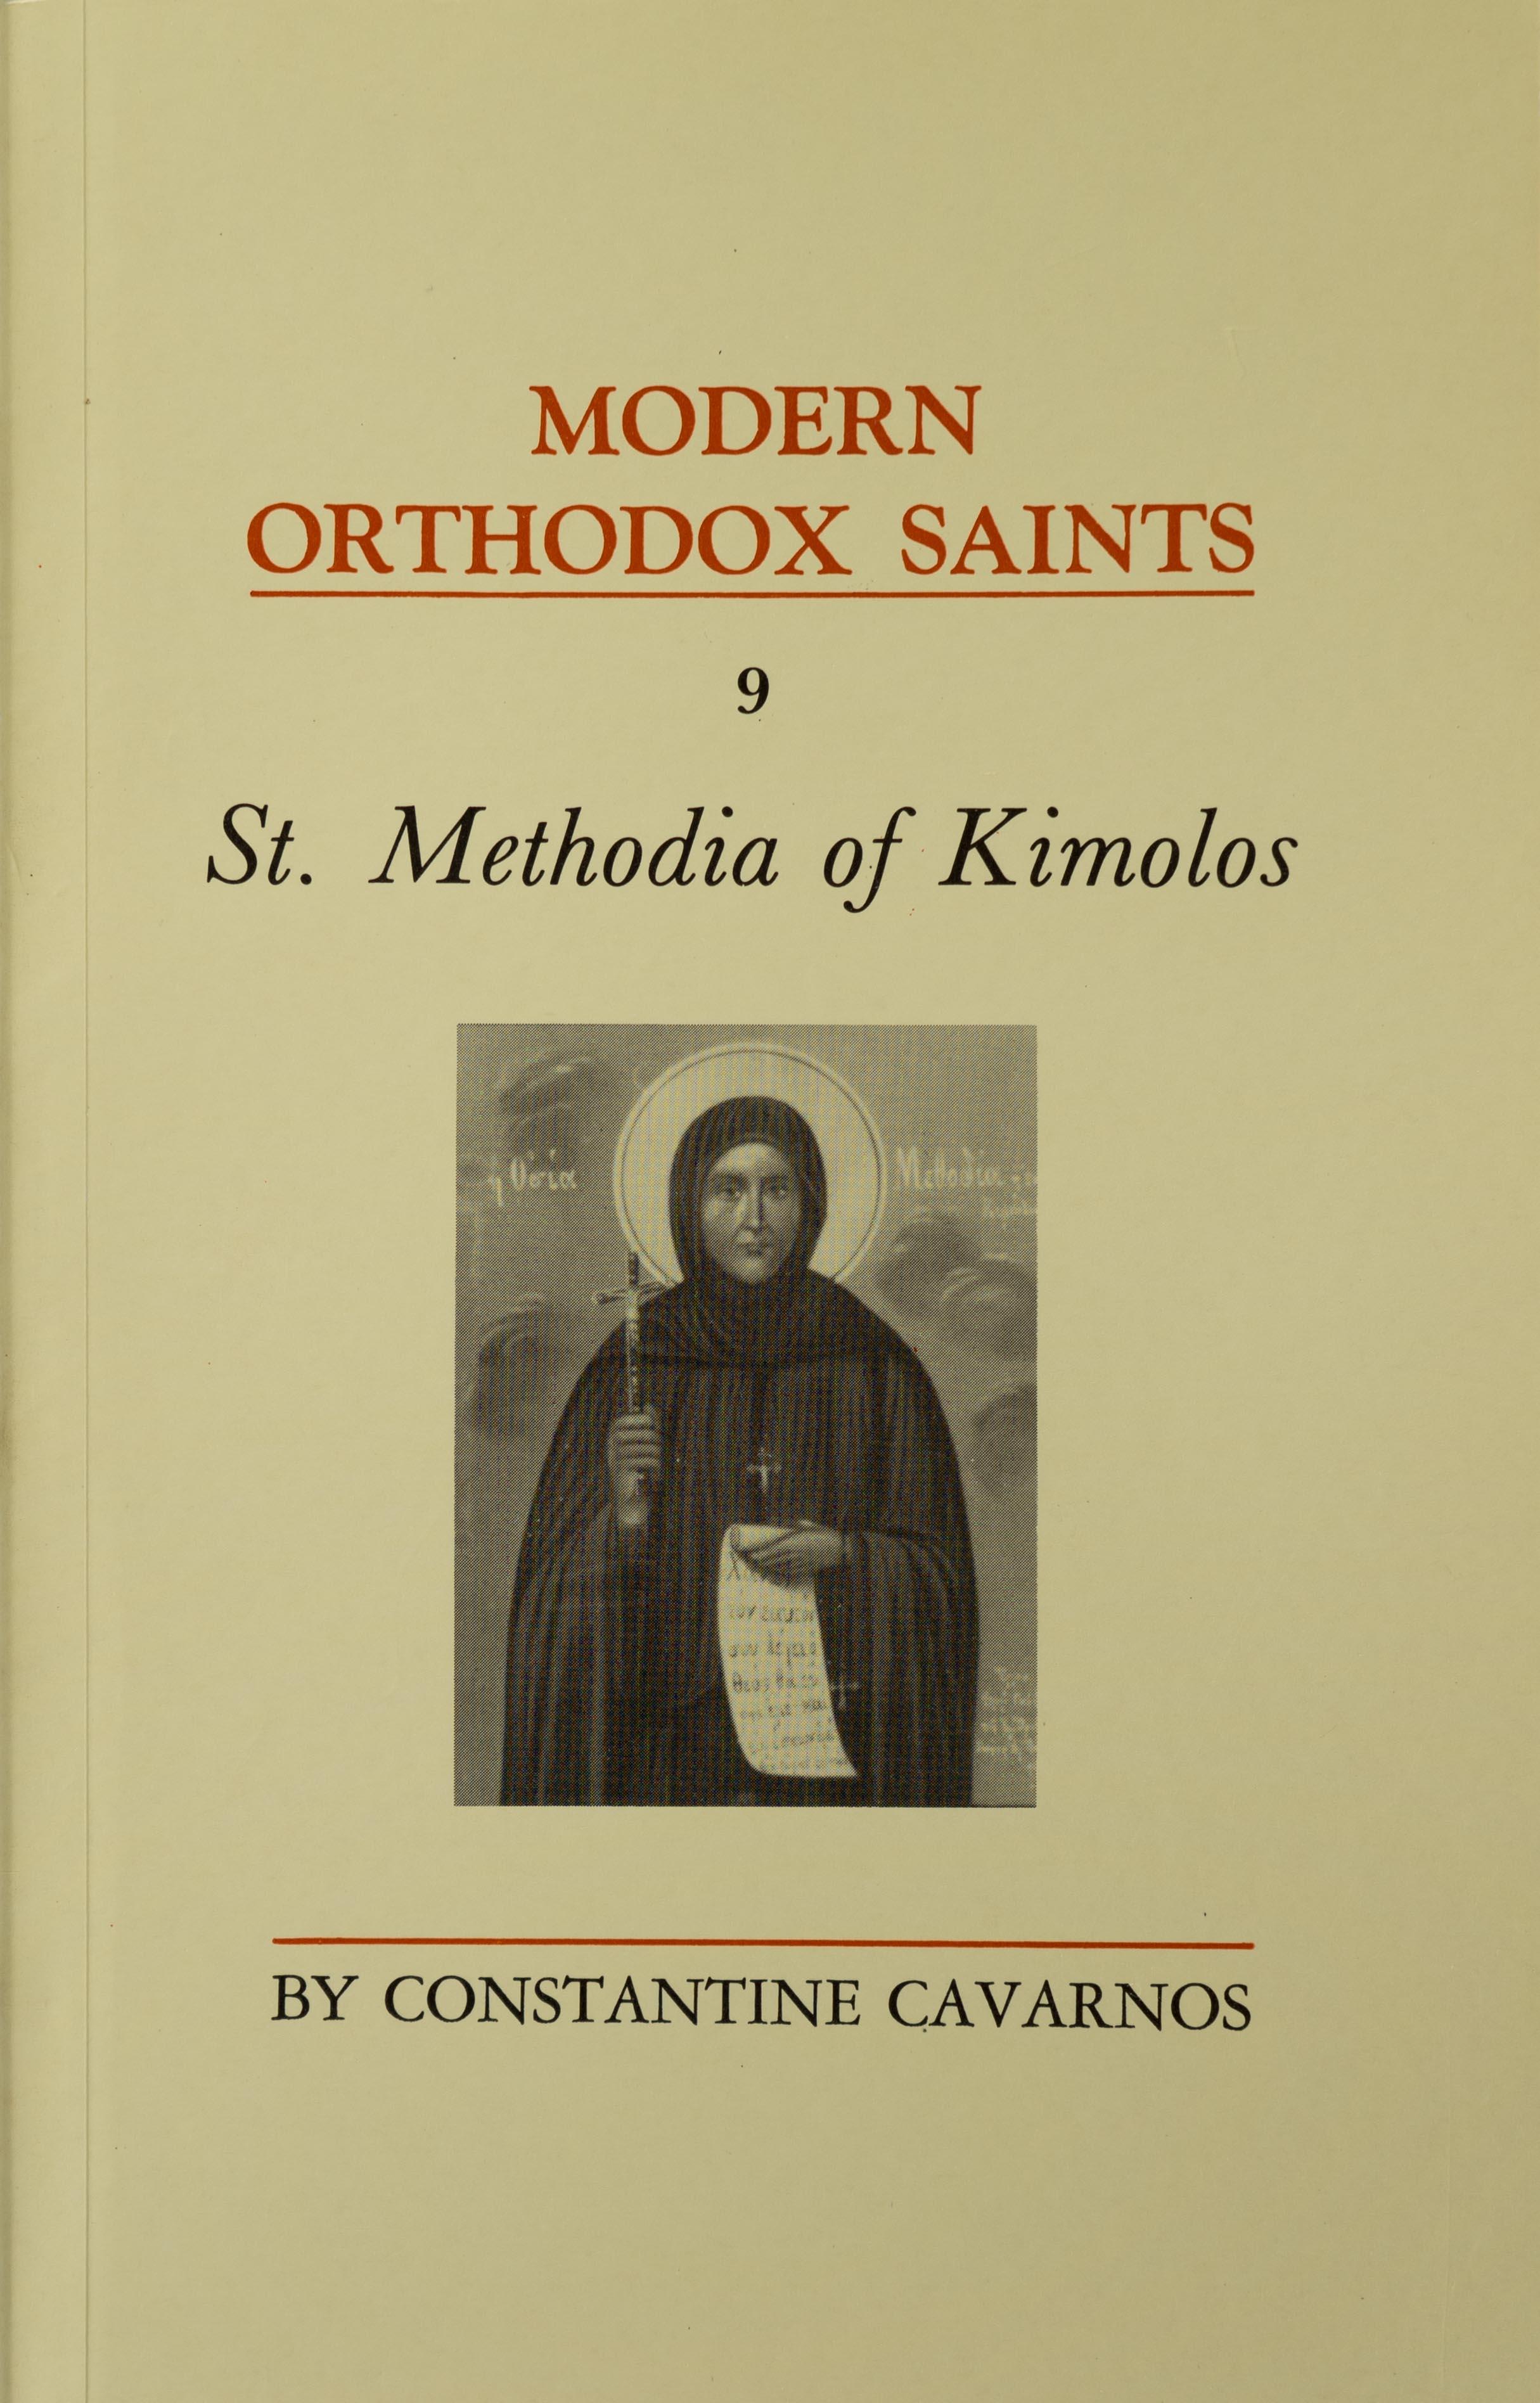 Modern Orthodox Saints 09: St Methodia of Kimolos